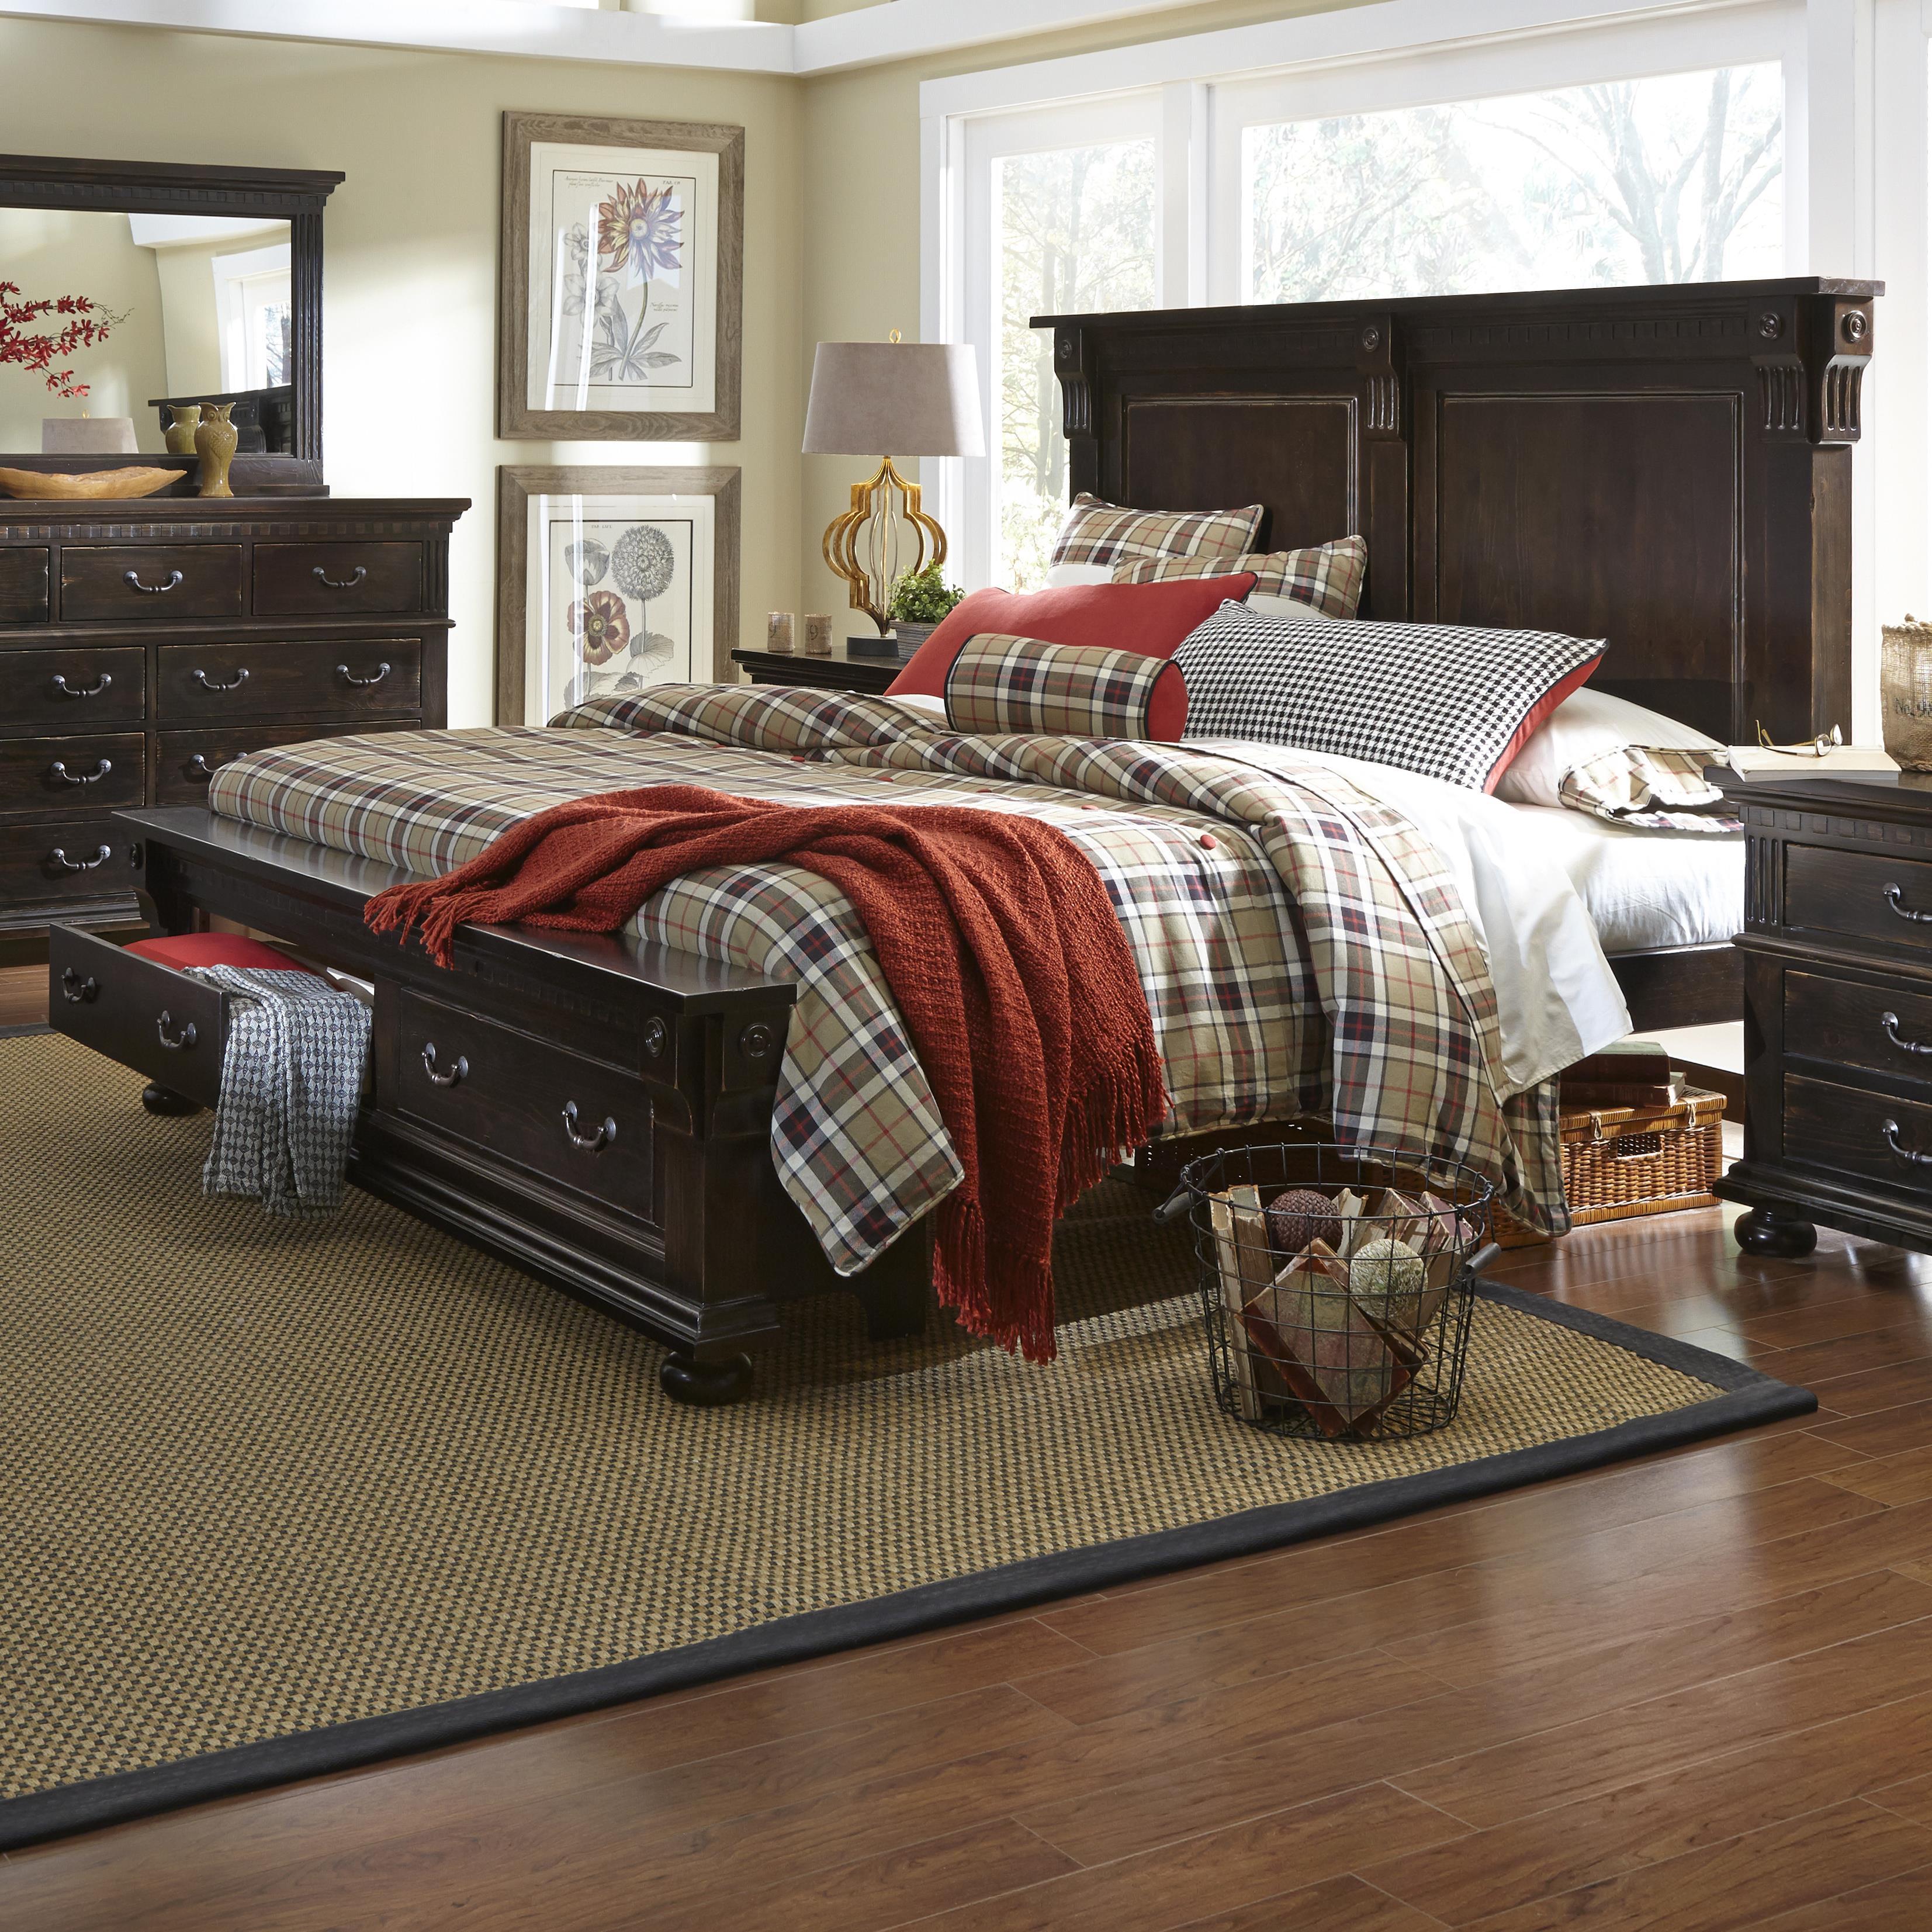 Progressive Furniture La Cantera King Storage Bed - Item Number: P665-94+95+78